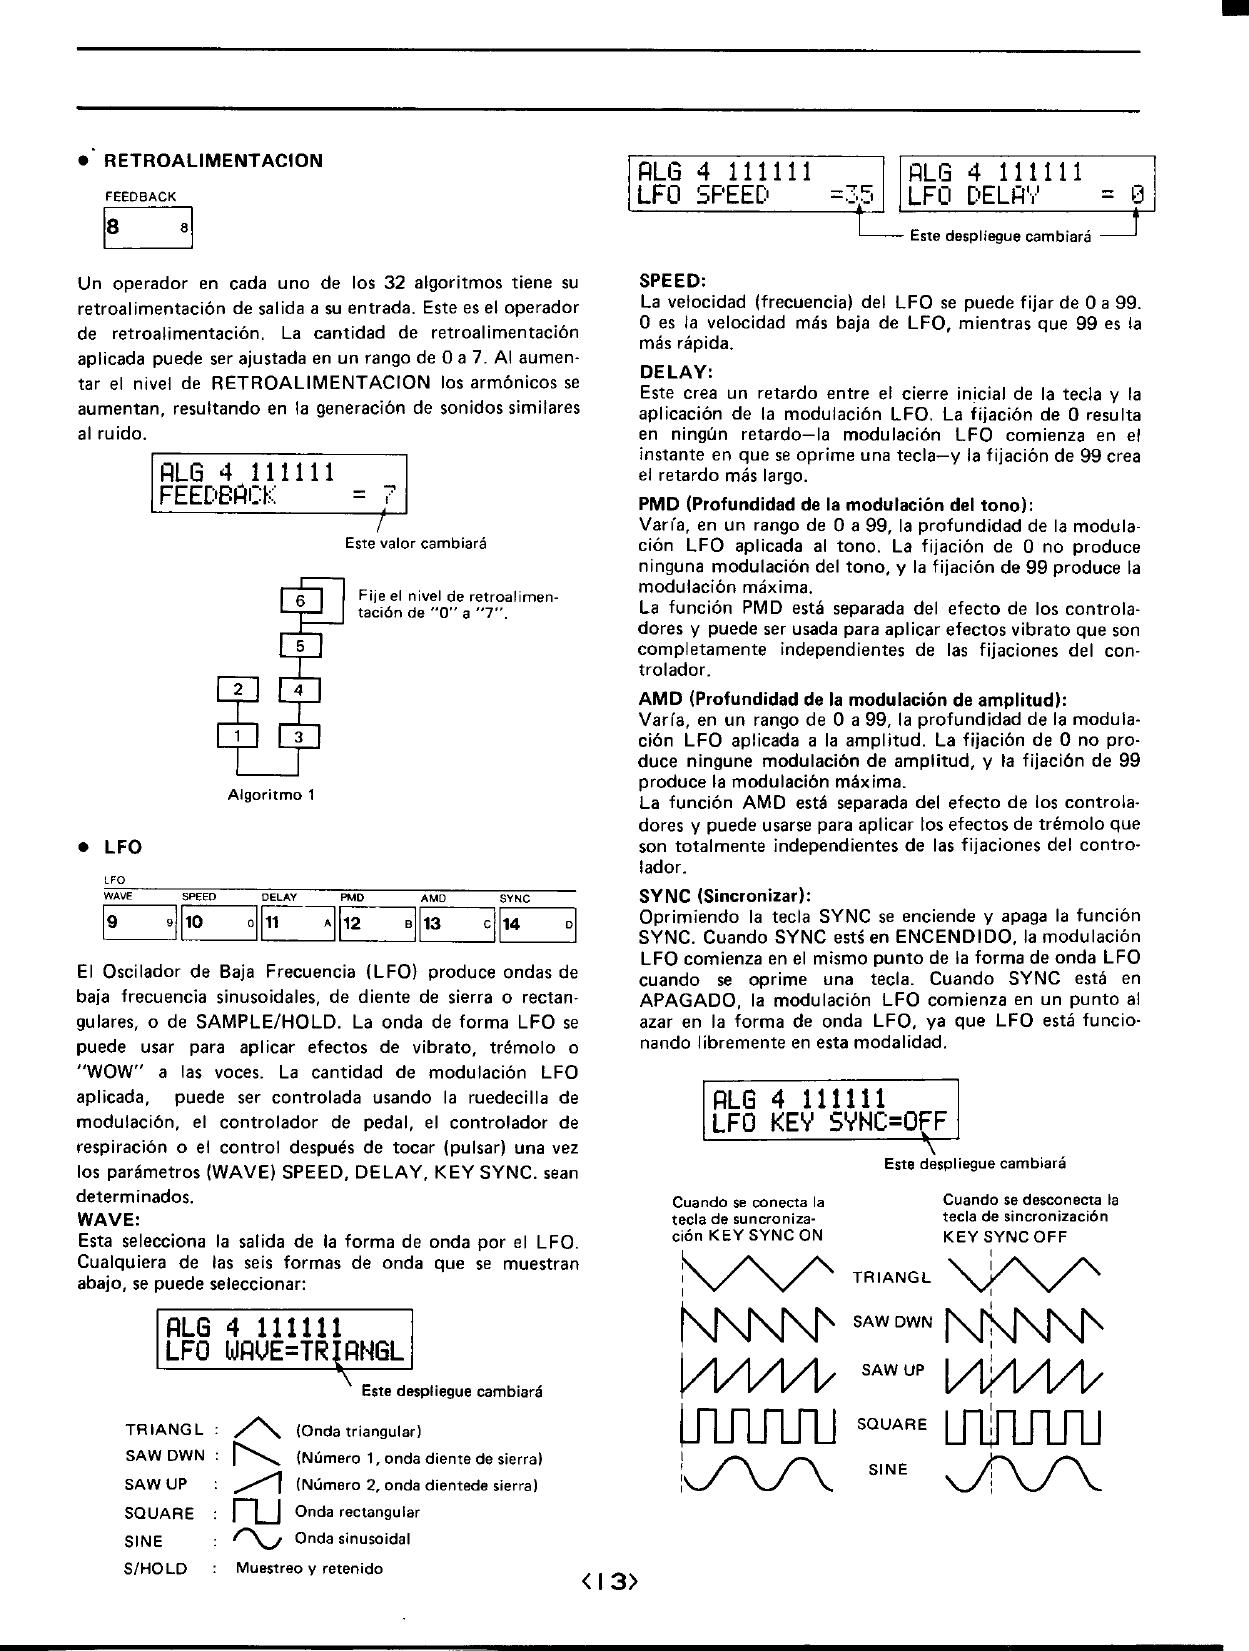 Yamaha DX7 Owner's Manual (Image) DX7S